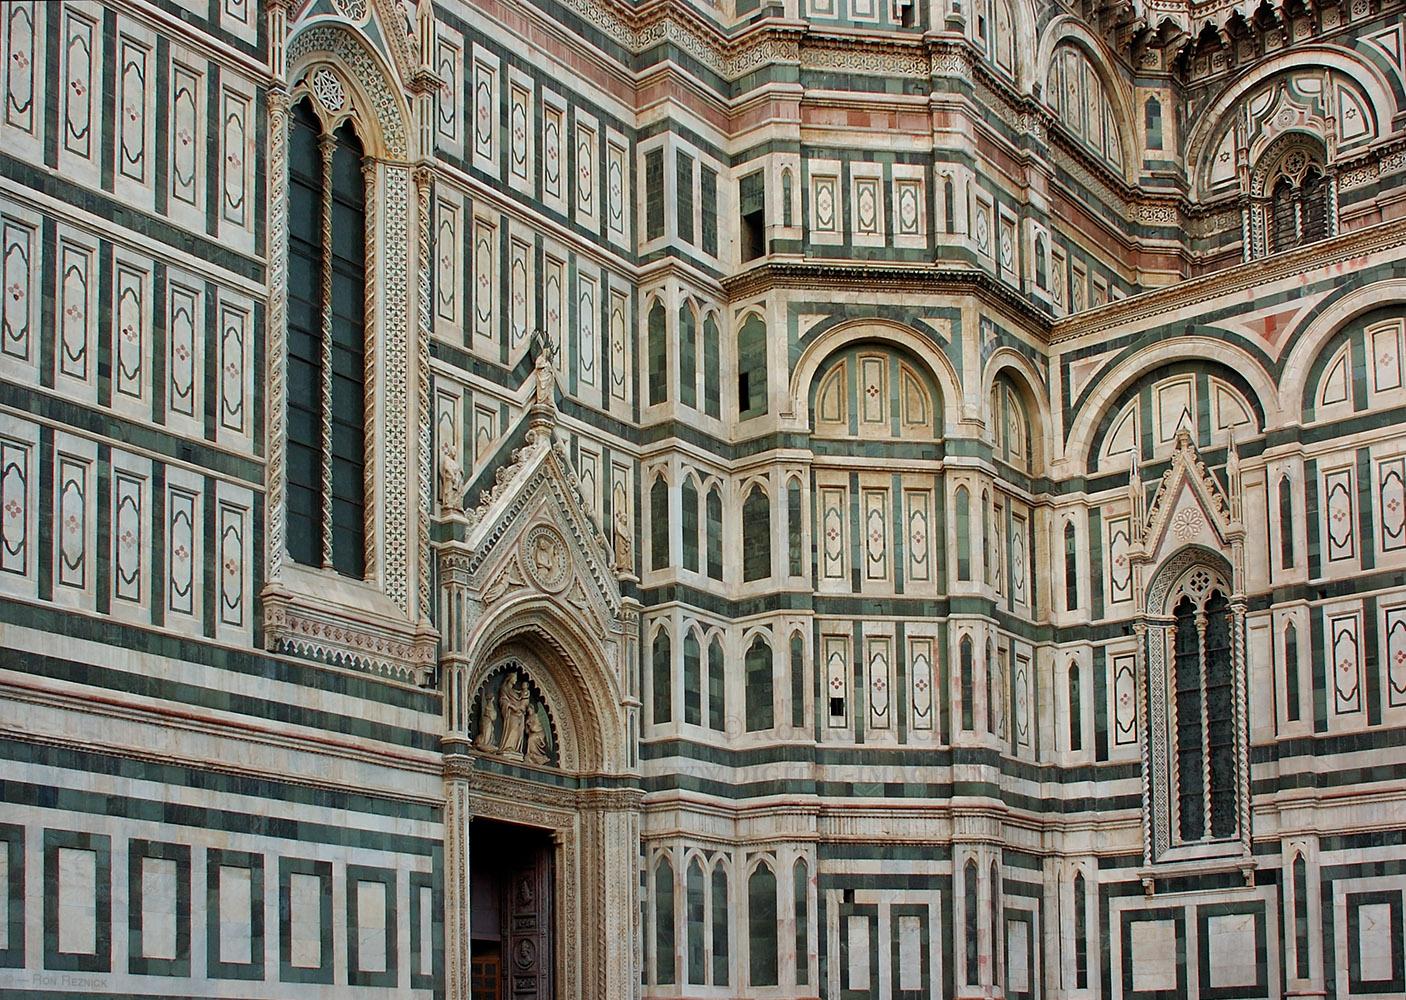 Facade: Santa Maria Del Fiore (Duomo) Architectural Details